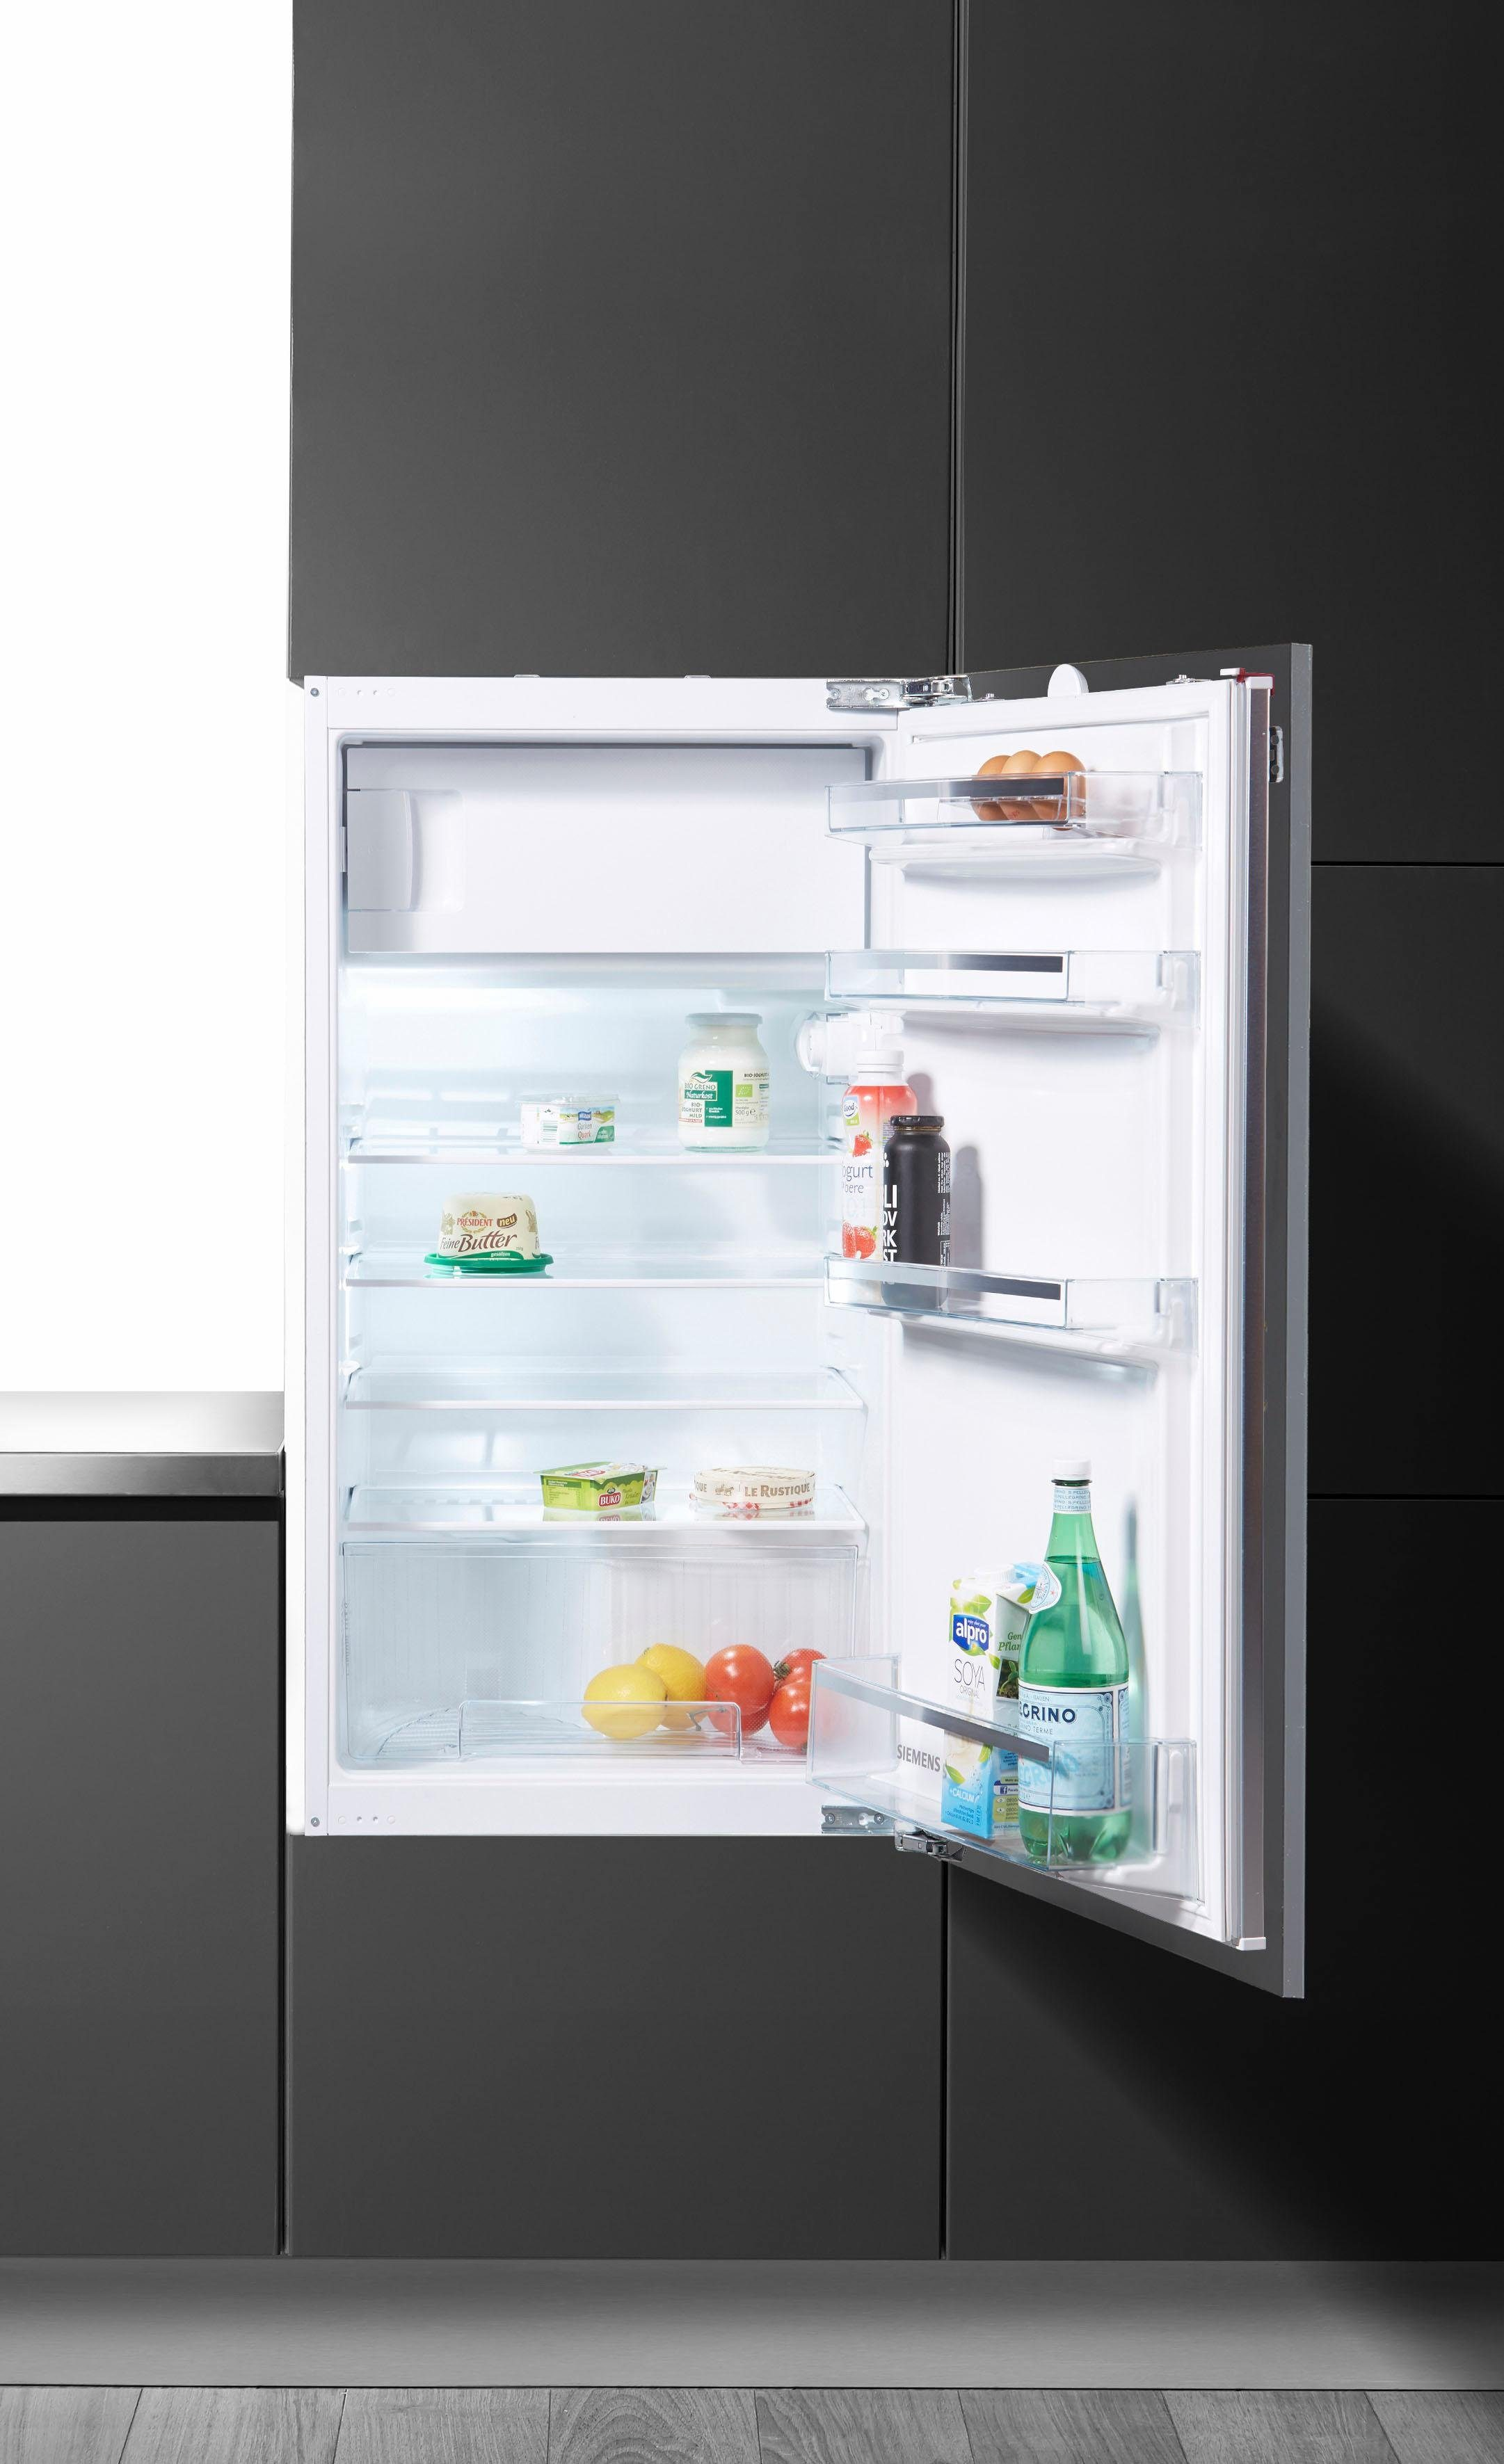 Siemens Einbau-Kühlschrank KI20LV62, Energieklasse A++, 102,1 cm hoch